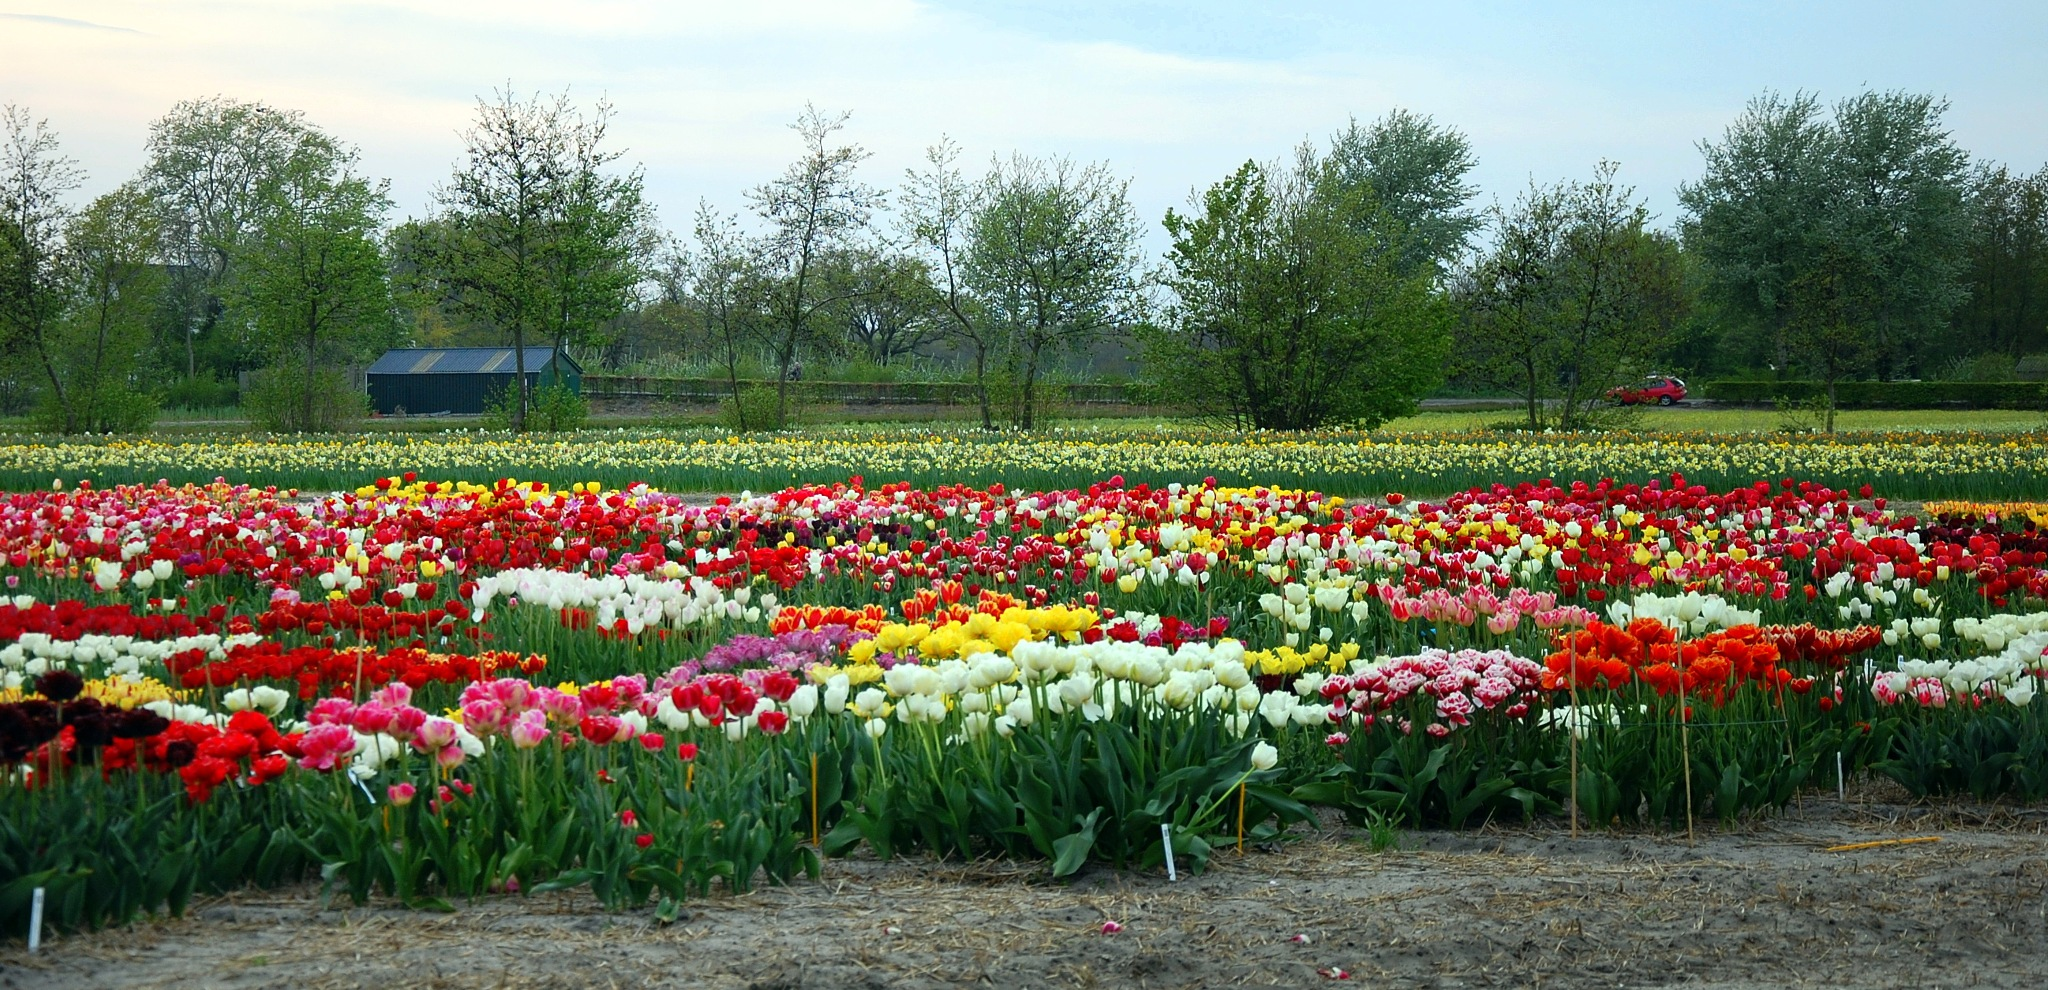 Tulpen droom by goga.dt